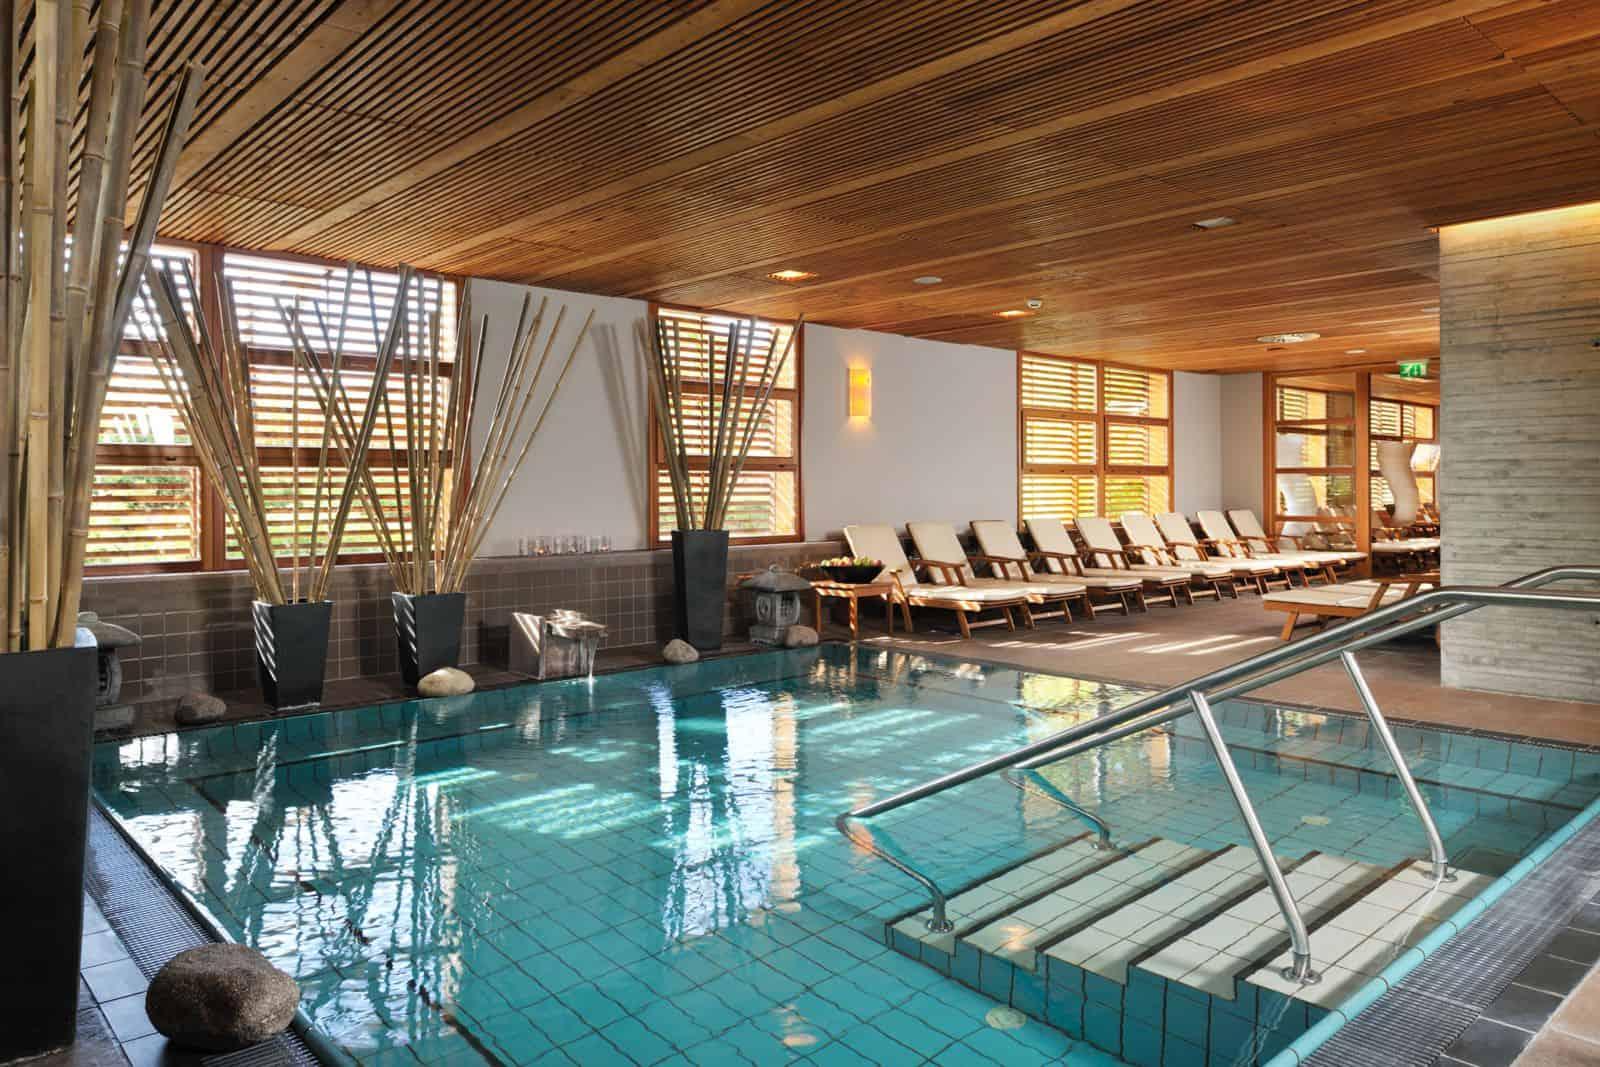 Terme Krka: Design Hotel e Bagno Giapponese per una Pasqua al top